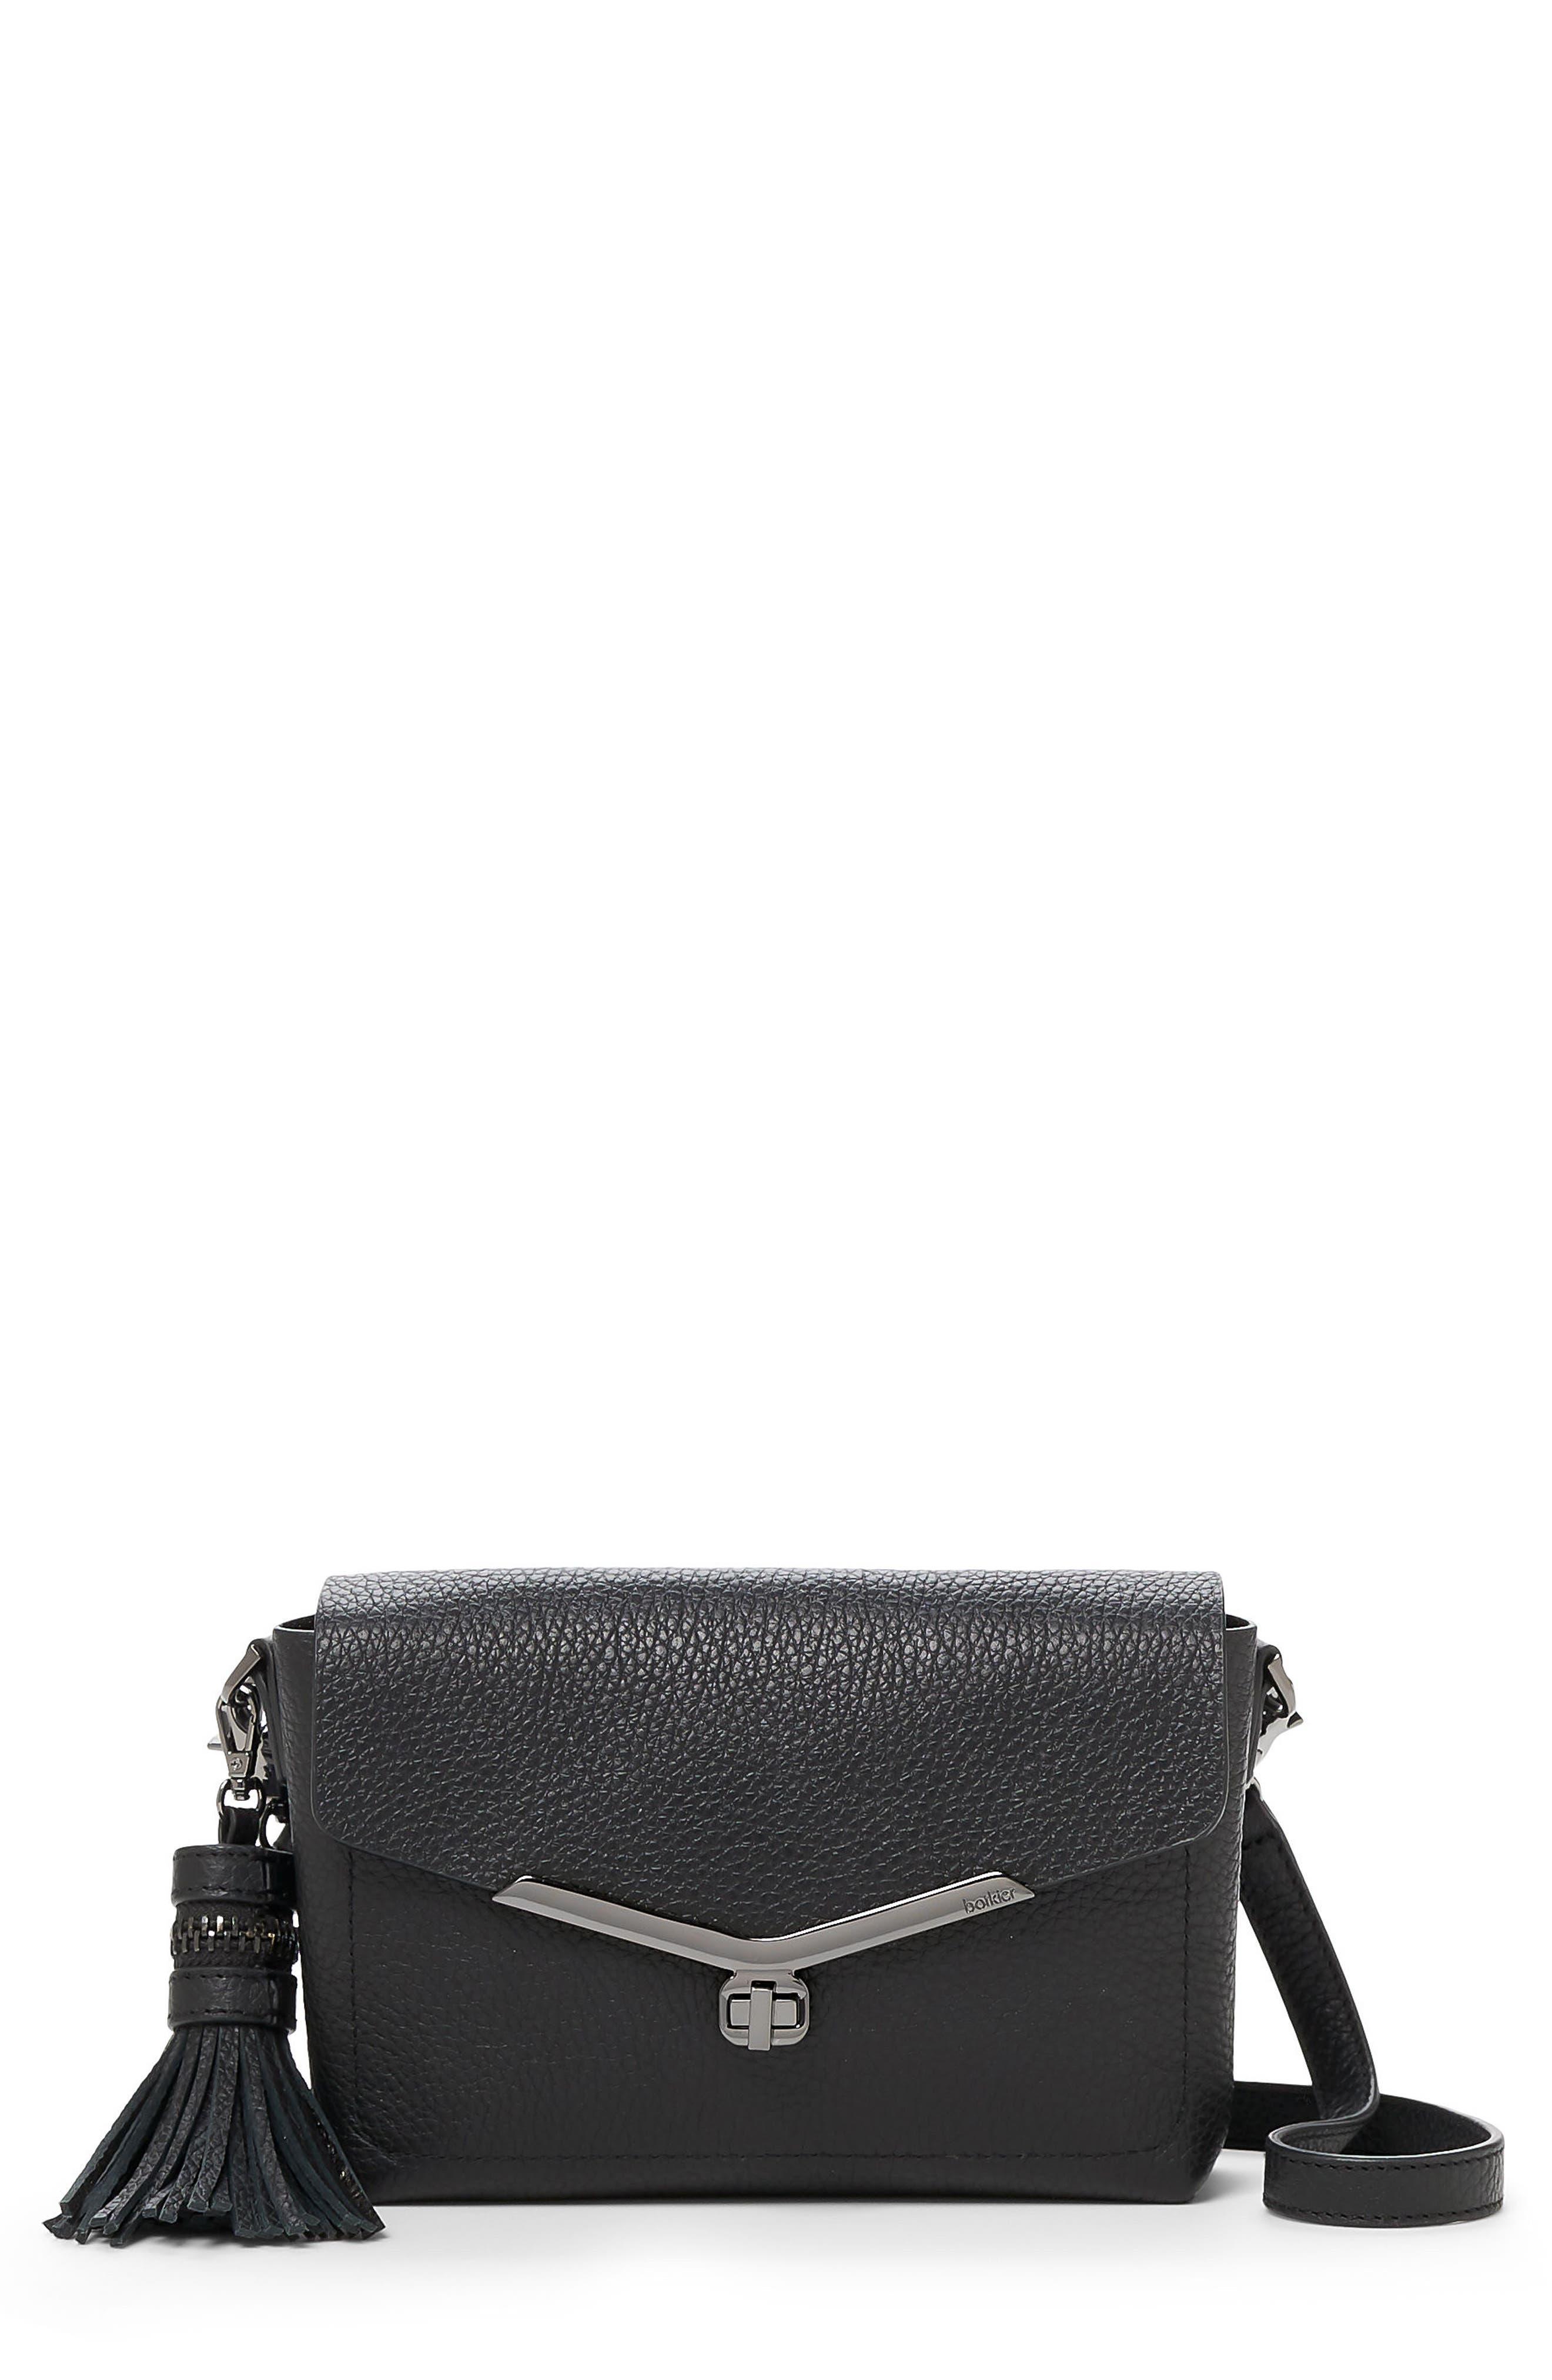 Vivi Leather Crossbody Bag,                             Main thumbnail 1, color,                             001